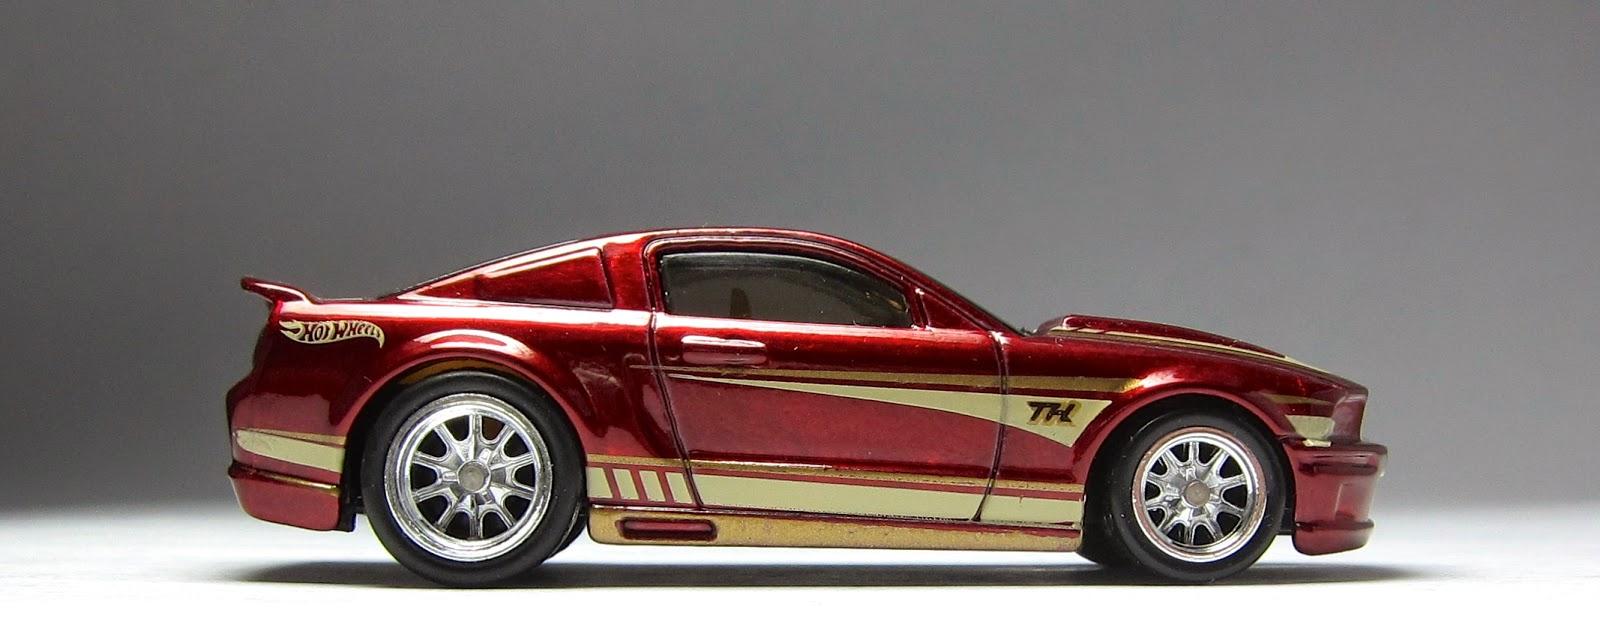 search results 2014 camaro ss hot wheels edition 0 autos weblog. Black Bedroom Furniture Sets. Home Design Ideas